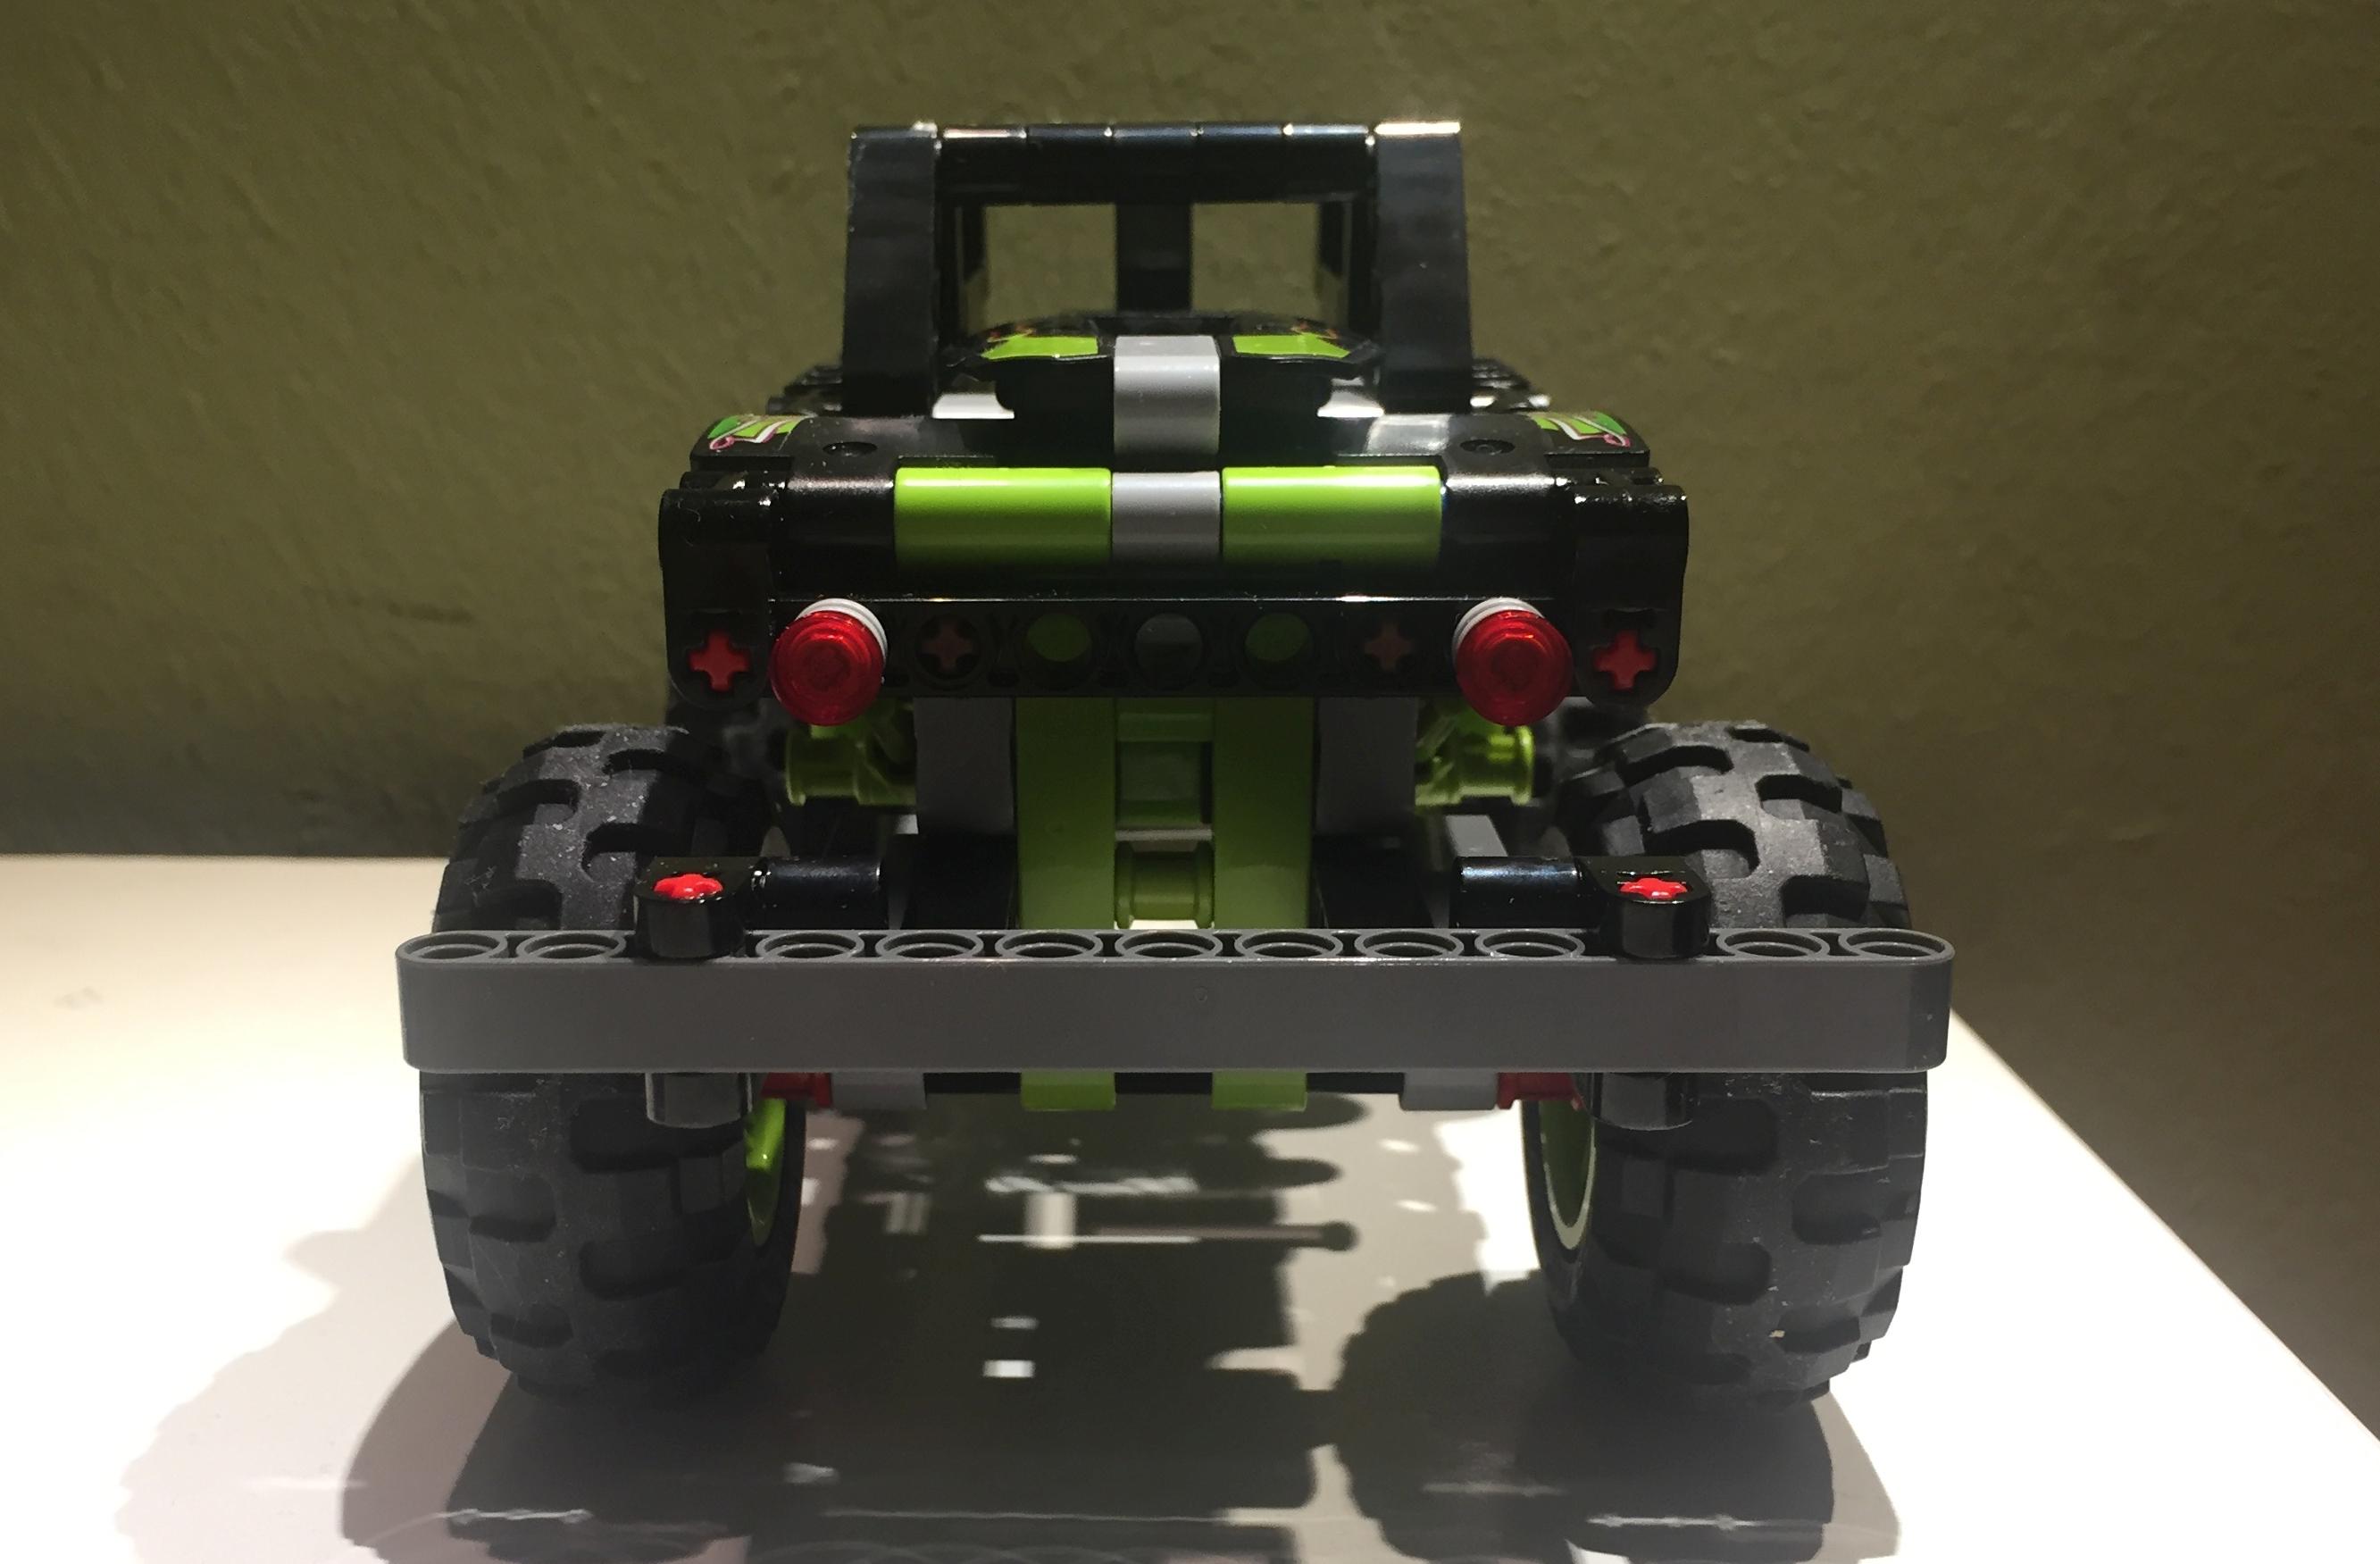 img-7148.JPG